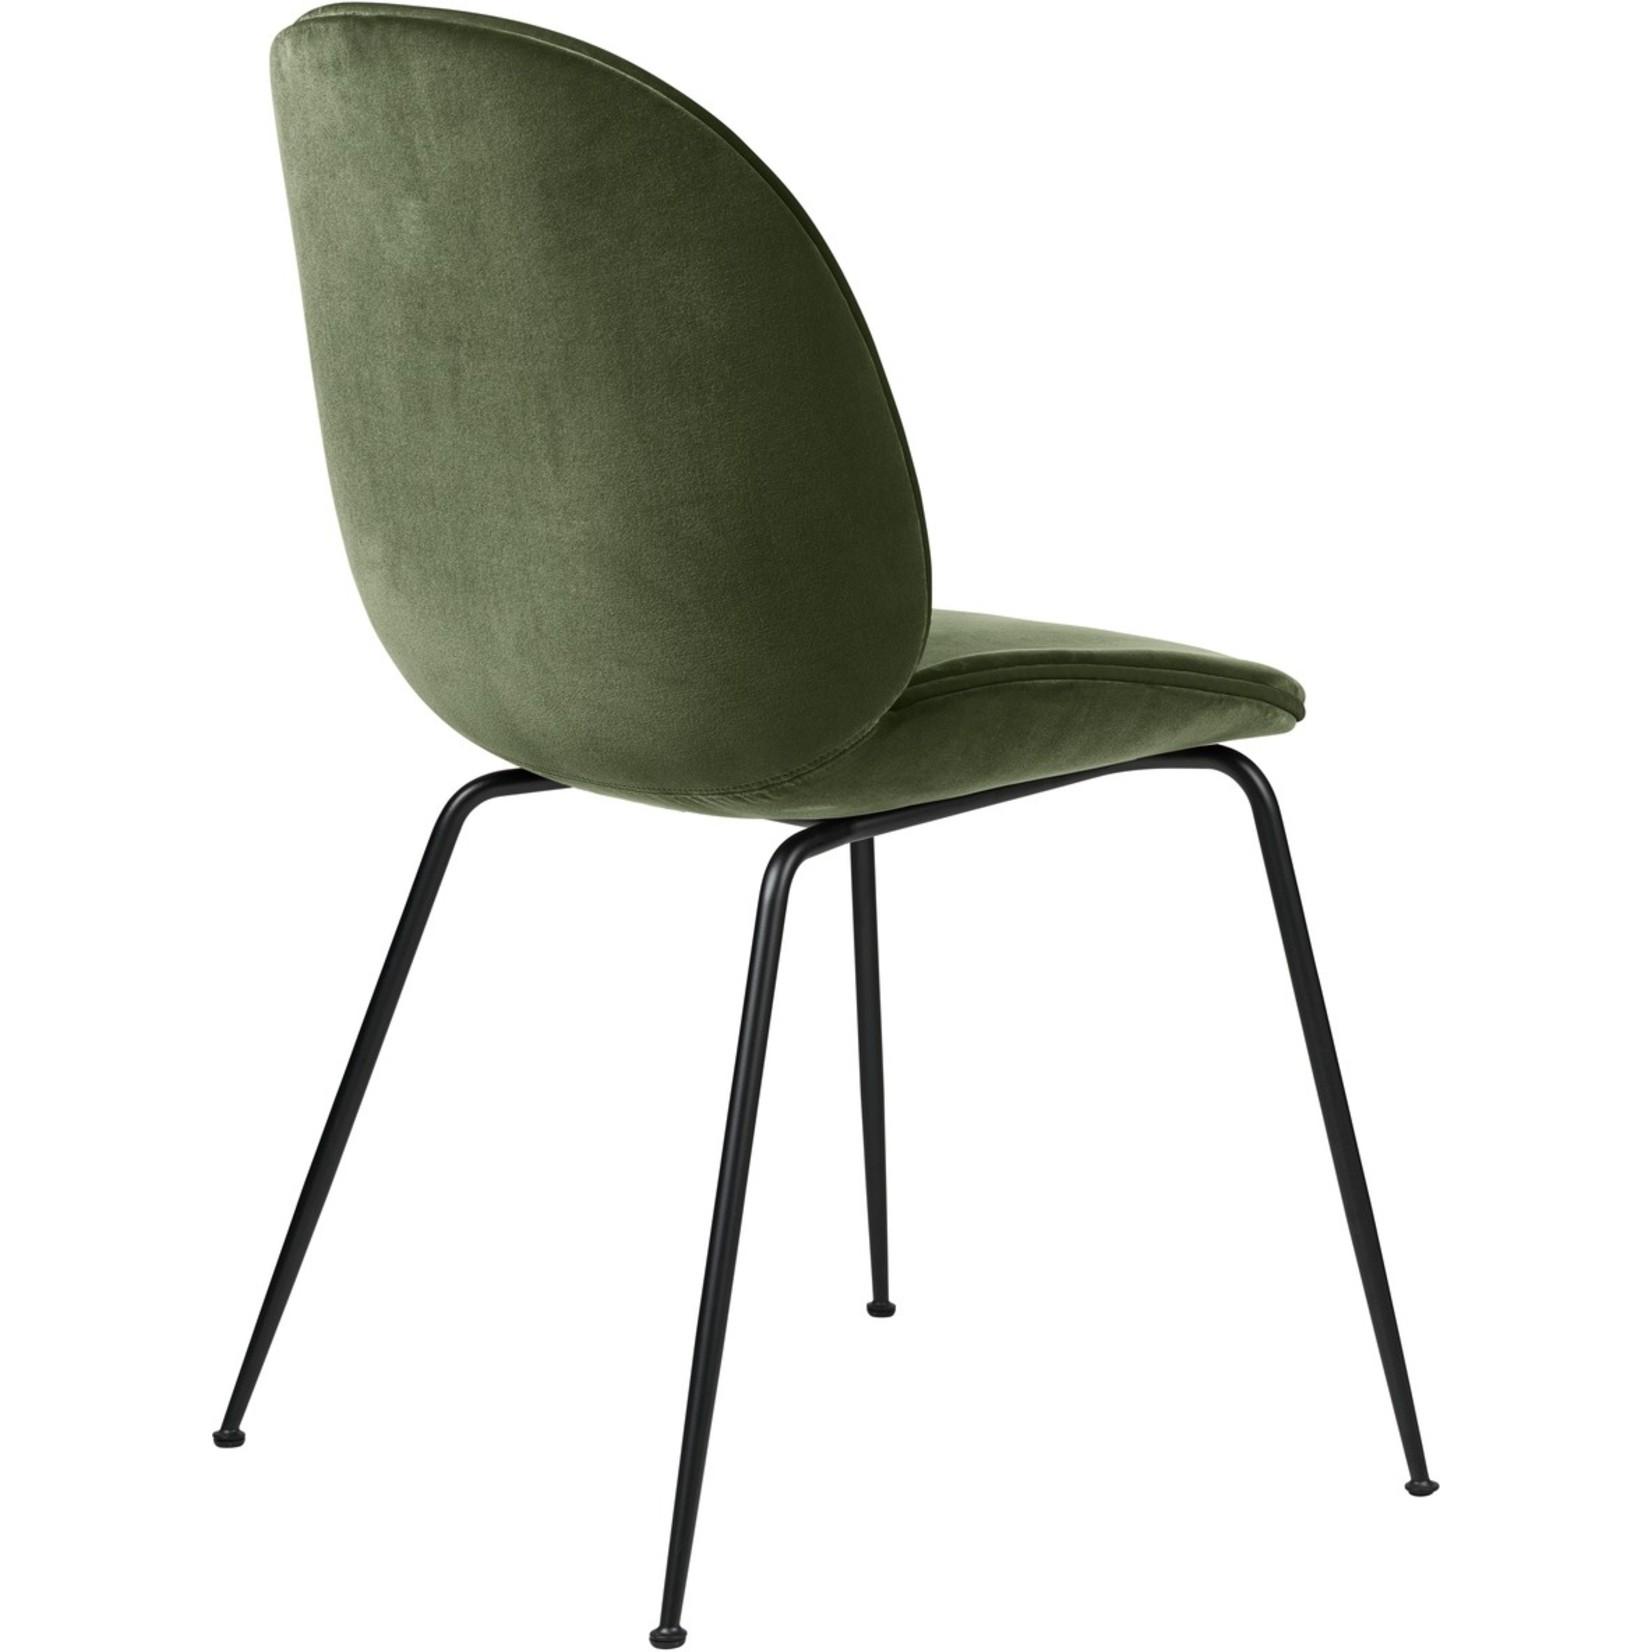 Gubi Chaise de salle à manger Beetle | Base mate vert fumé et noir